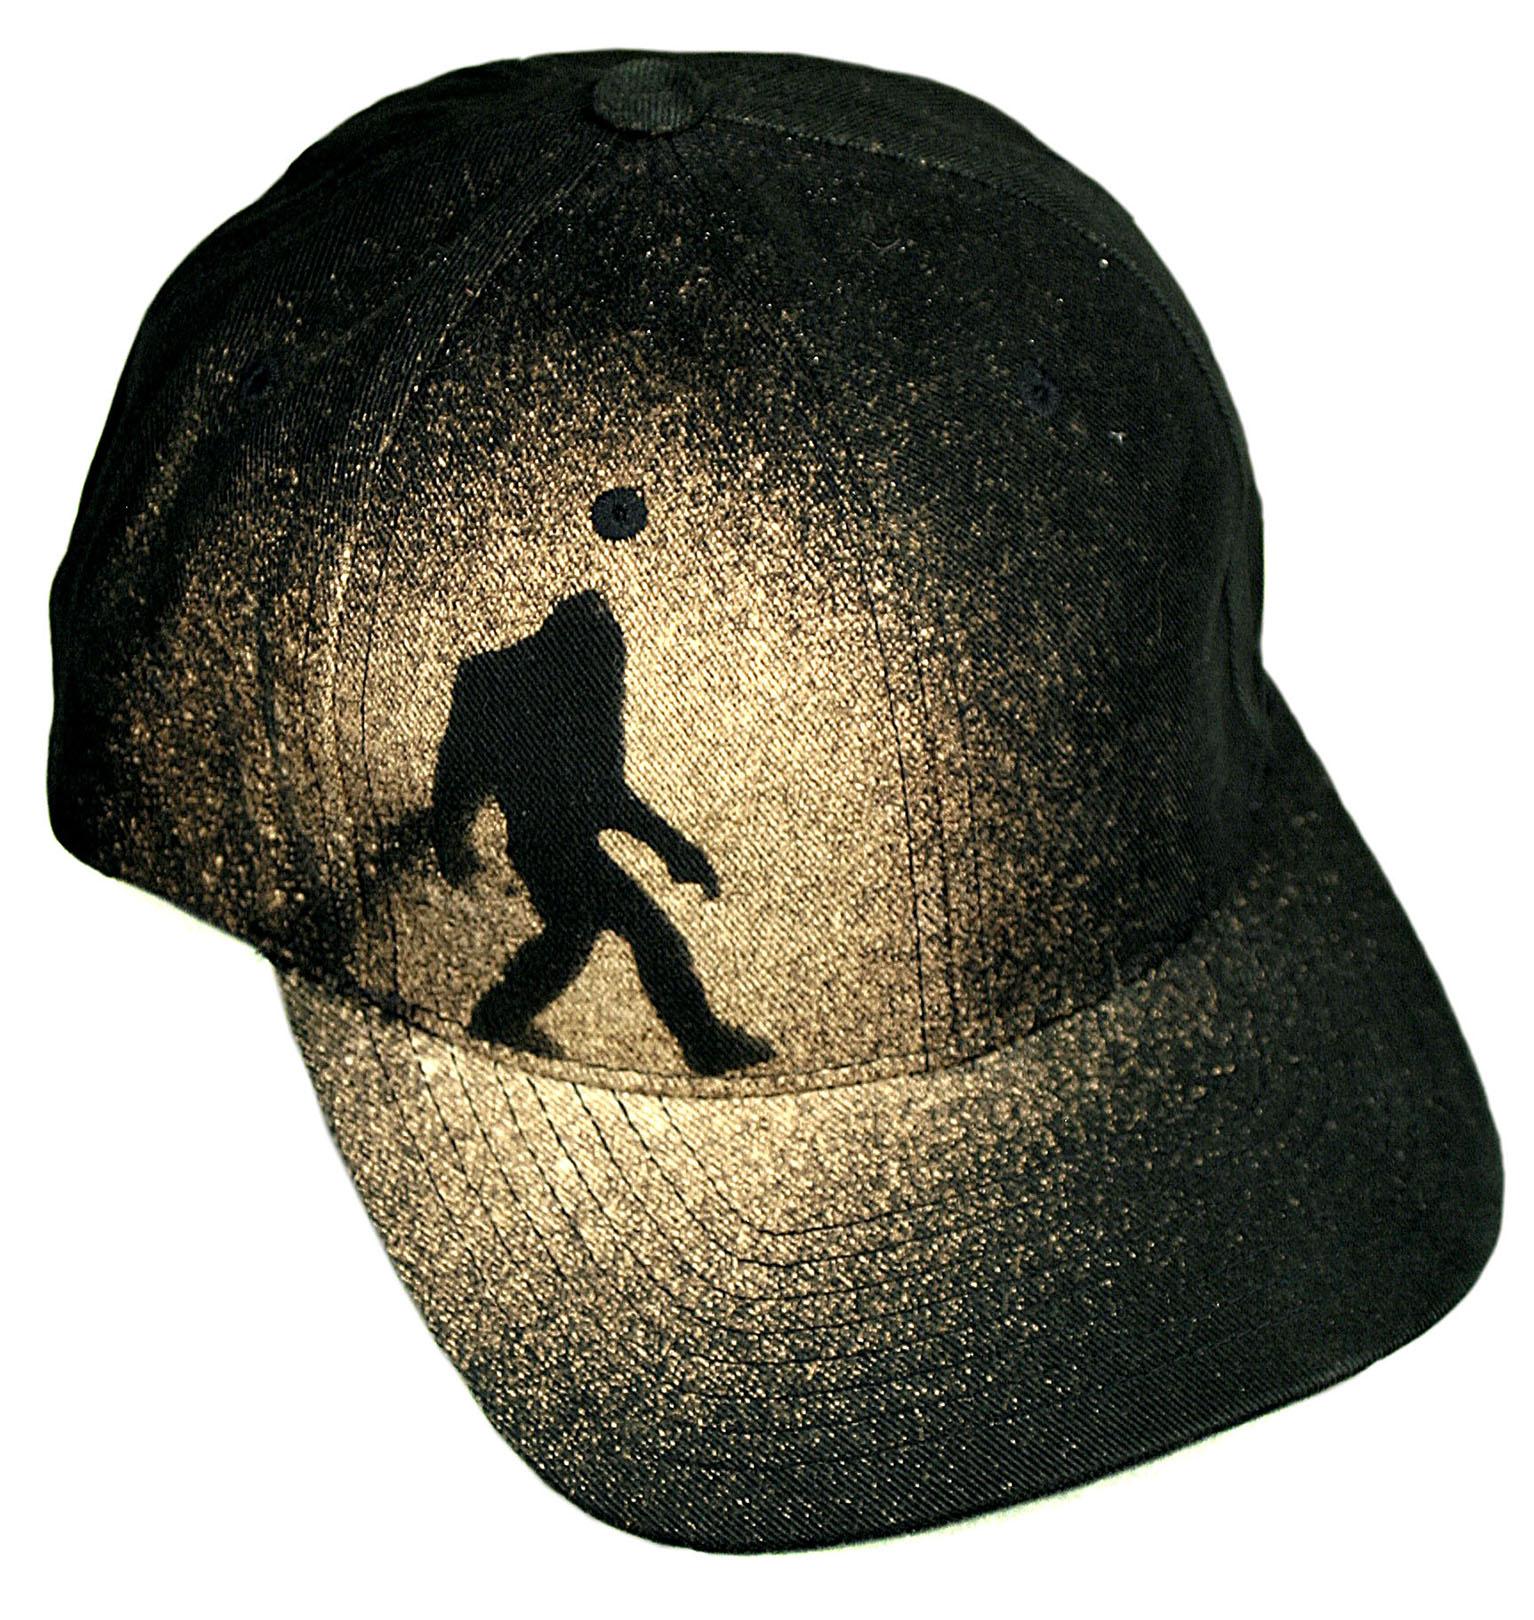 Squatch Hat Compare1.jpg